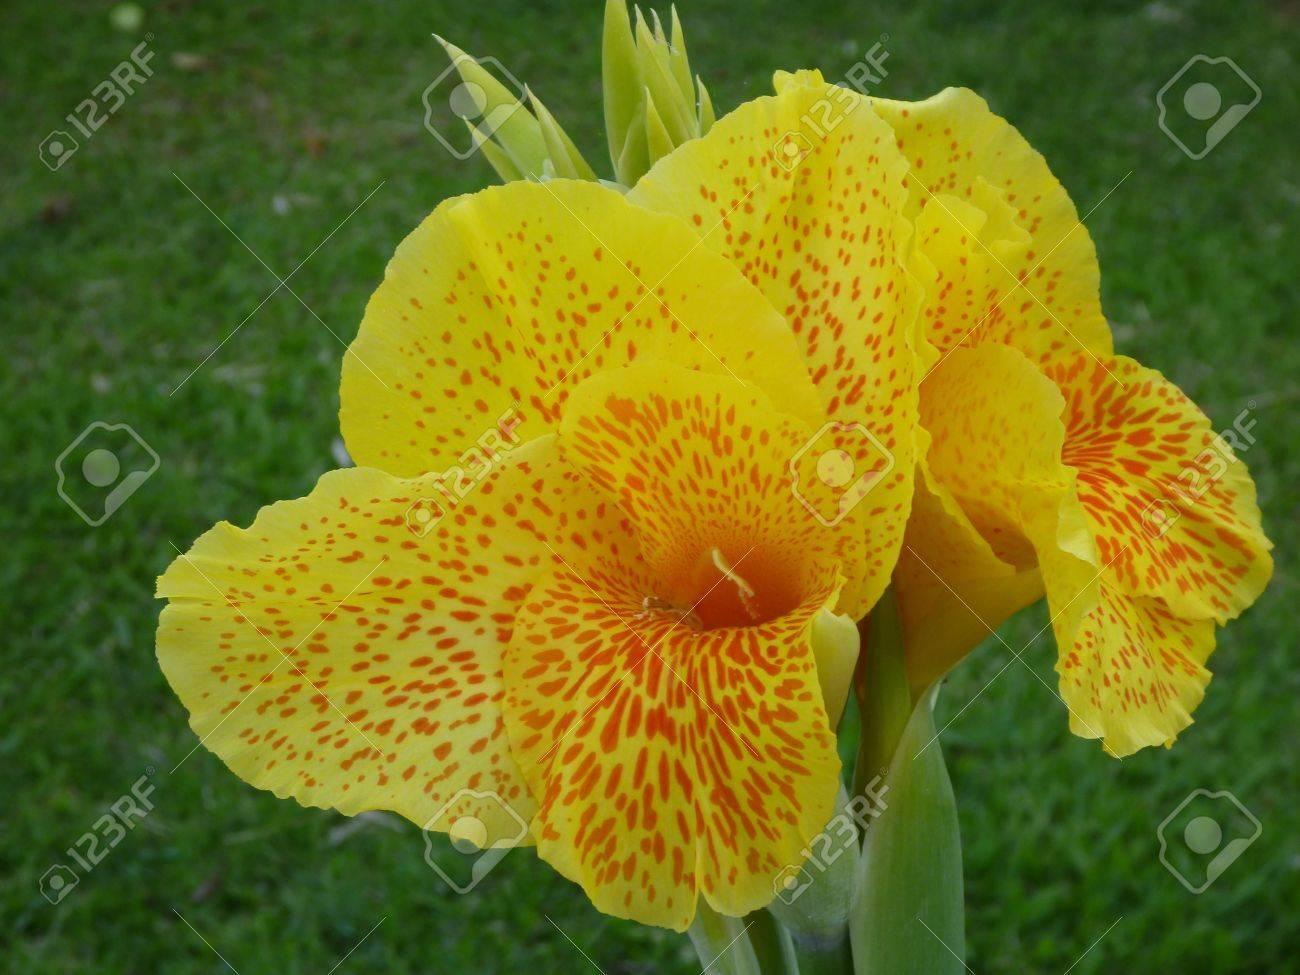 yellow tropical flower indonesia bali green background stock photo, Beautiful flower